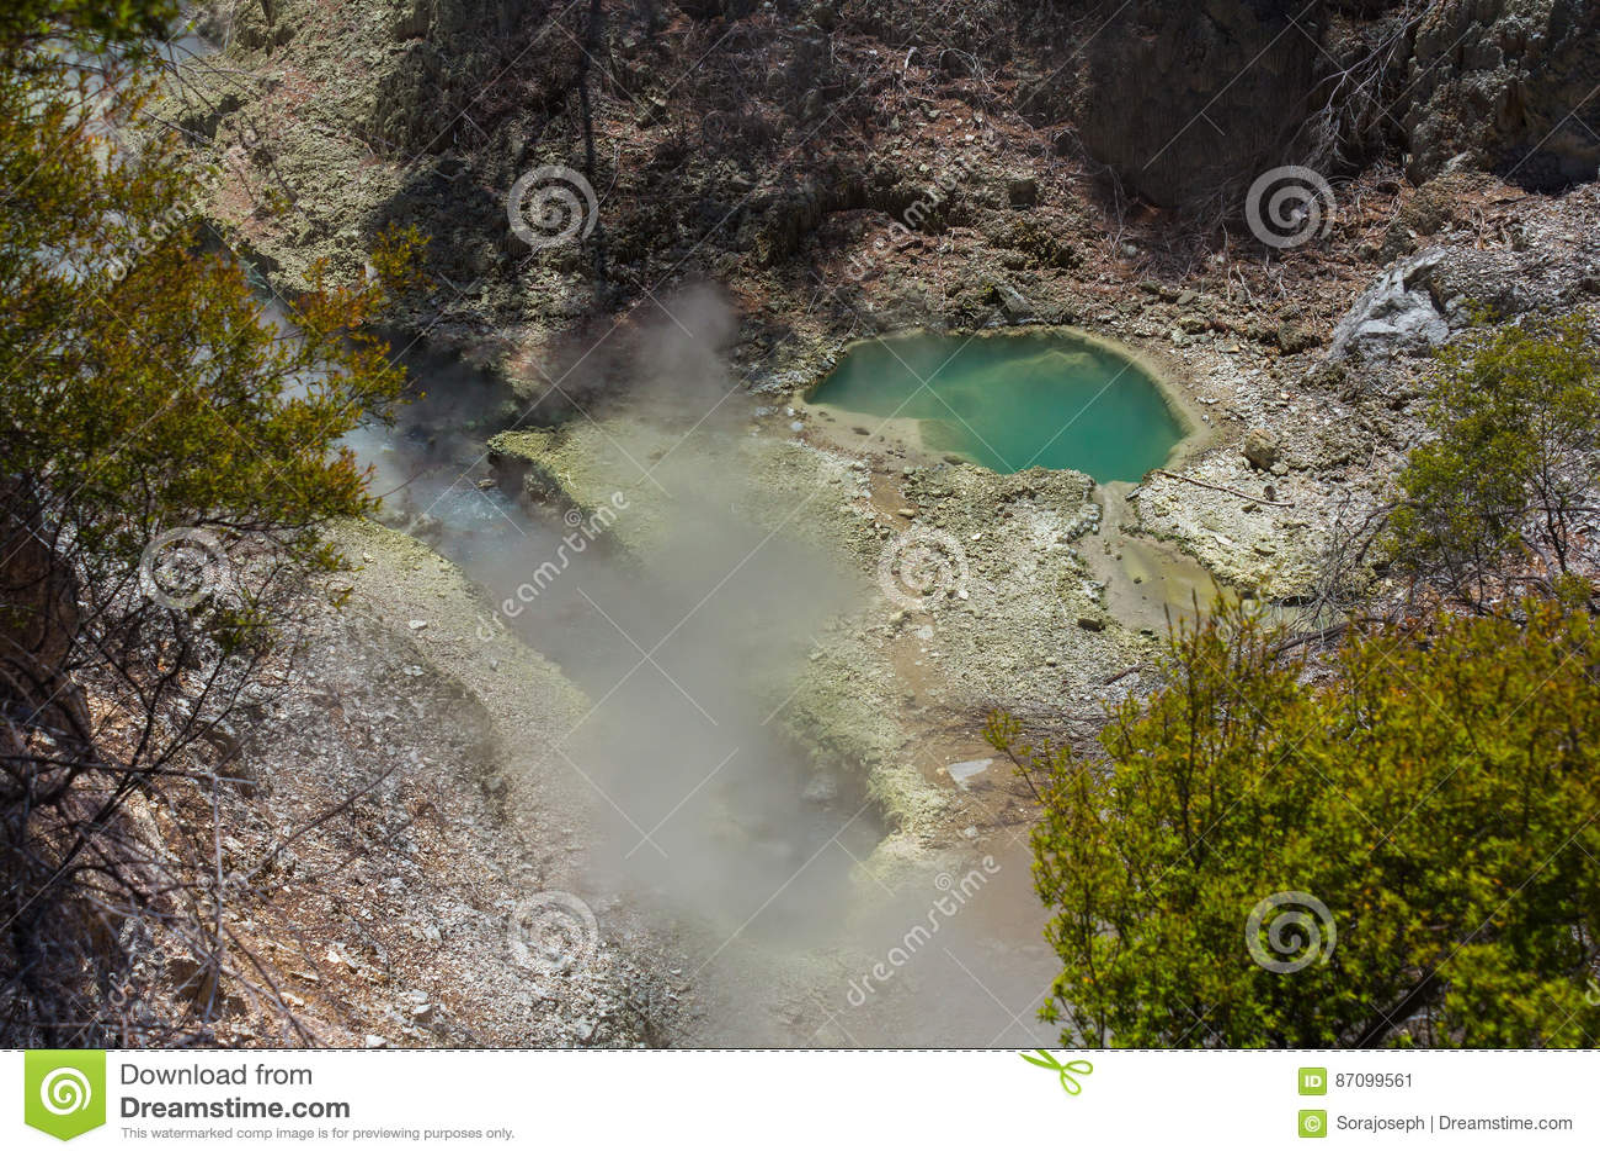 Volcanic Pools at Wai-O-Tapu or Sacred Waters – Thermal Wonderland Rotorua New Zealand